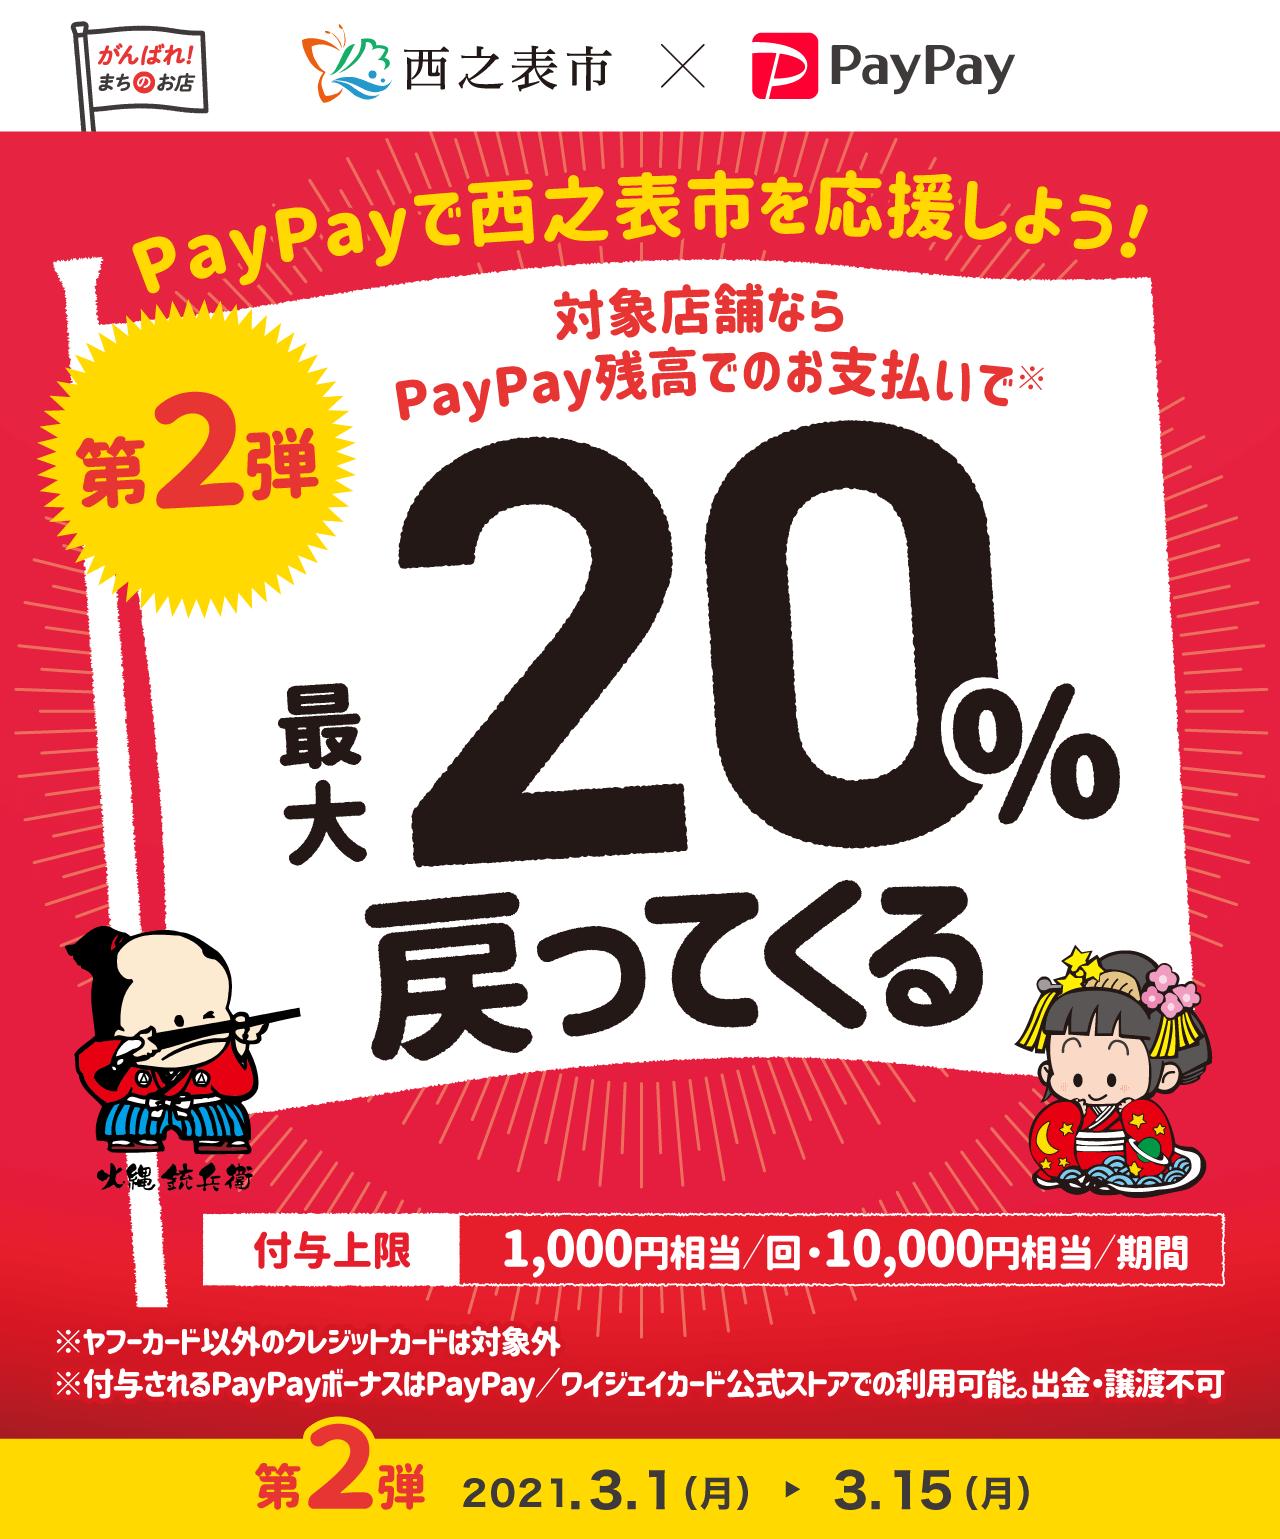 PayPayで西之表市を応援しよう! 第2弾 対象店舗ならPayPay残高でのお支払いで最大20%戻ってくる